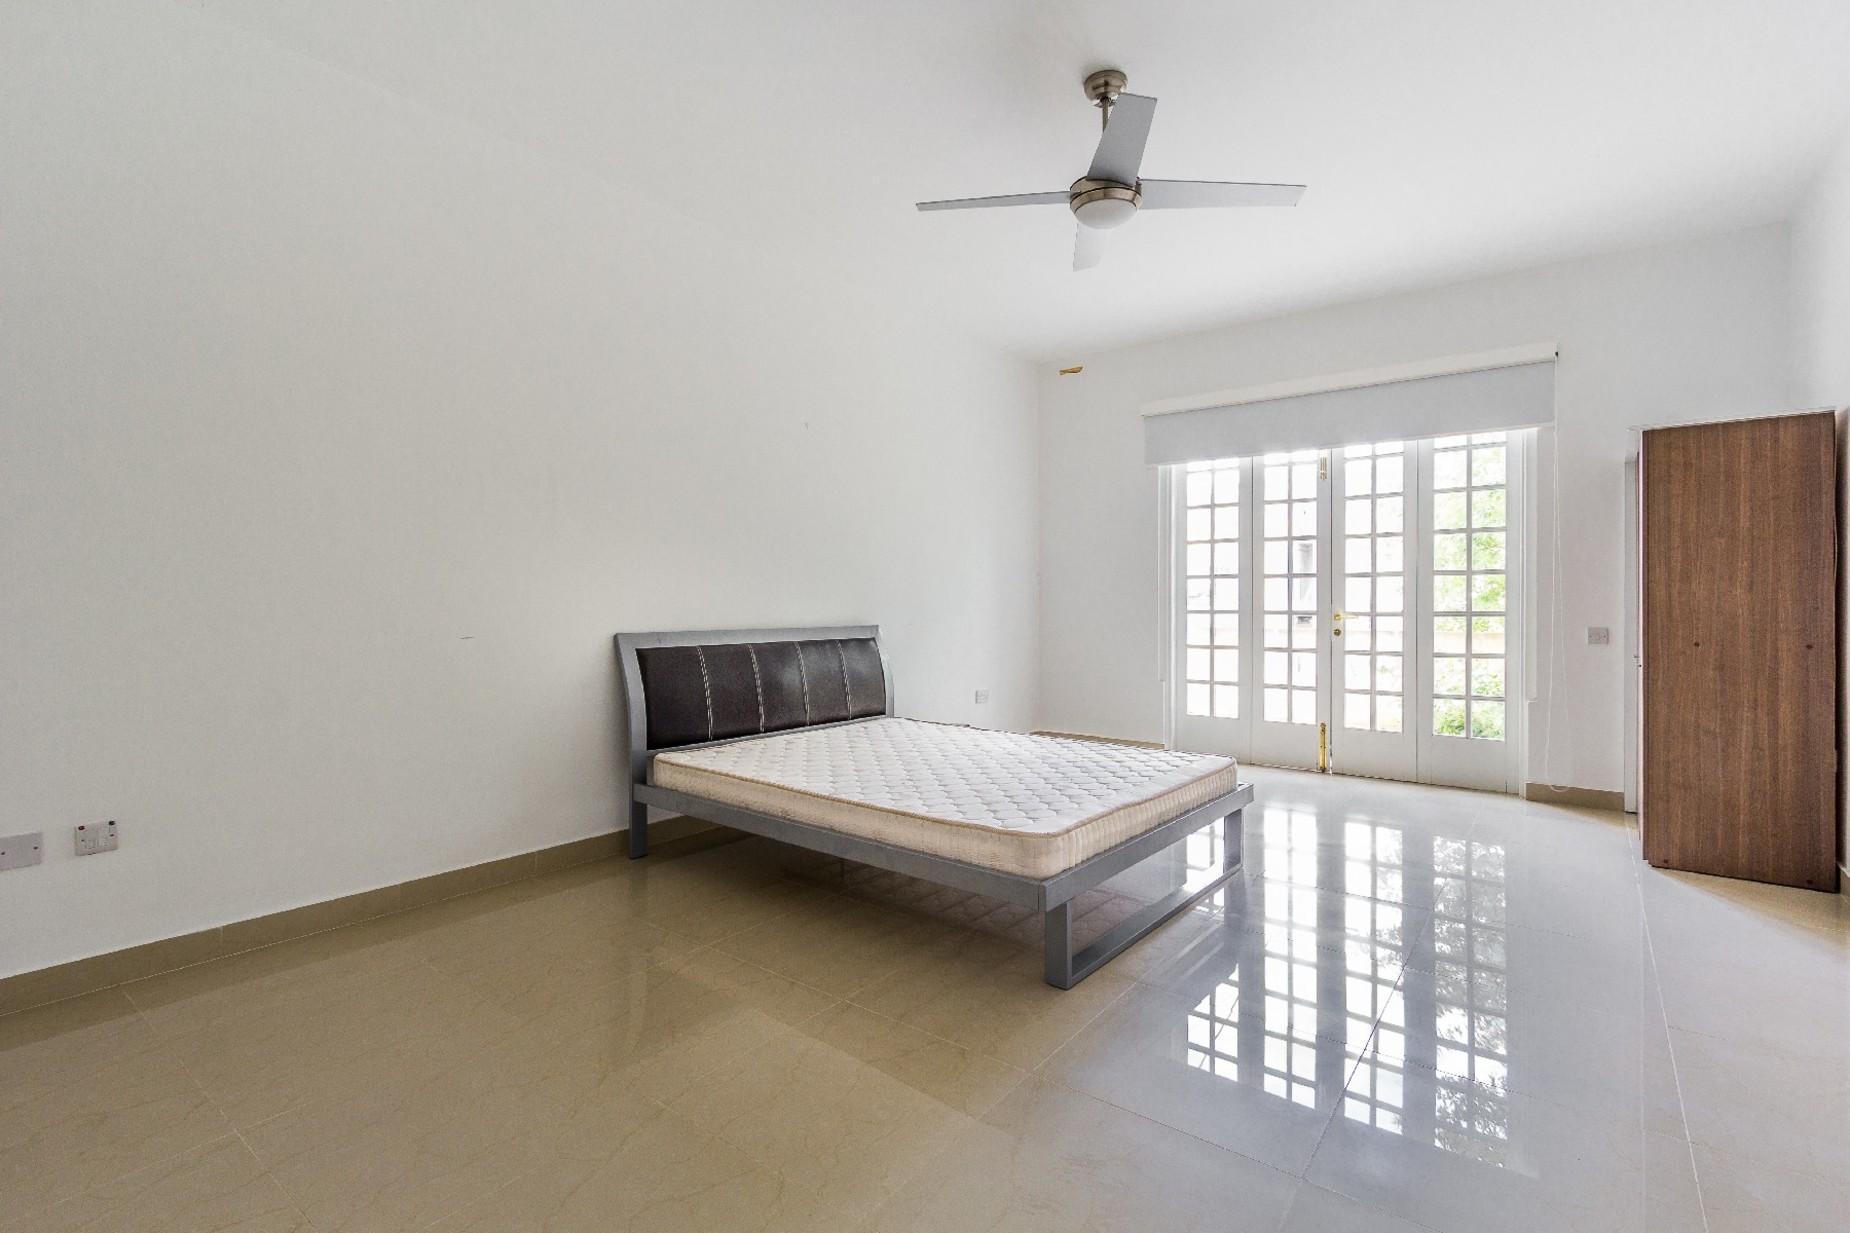 6 bed Palazzo For Rent in Balzan, Balzan - thumb 12